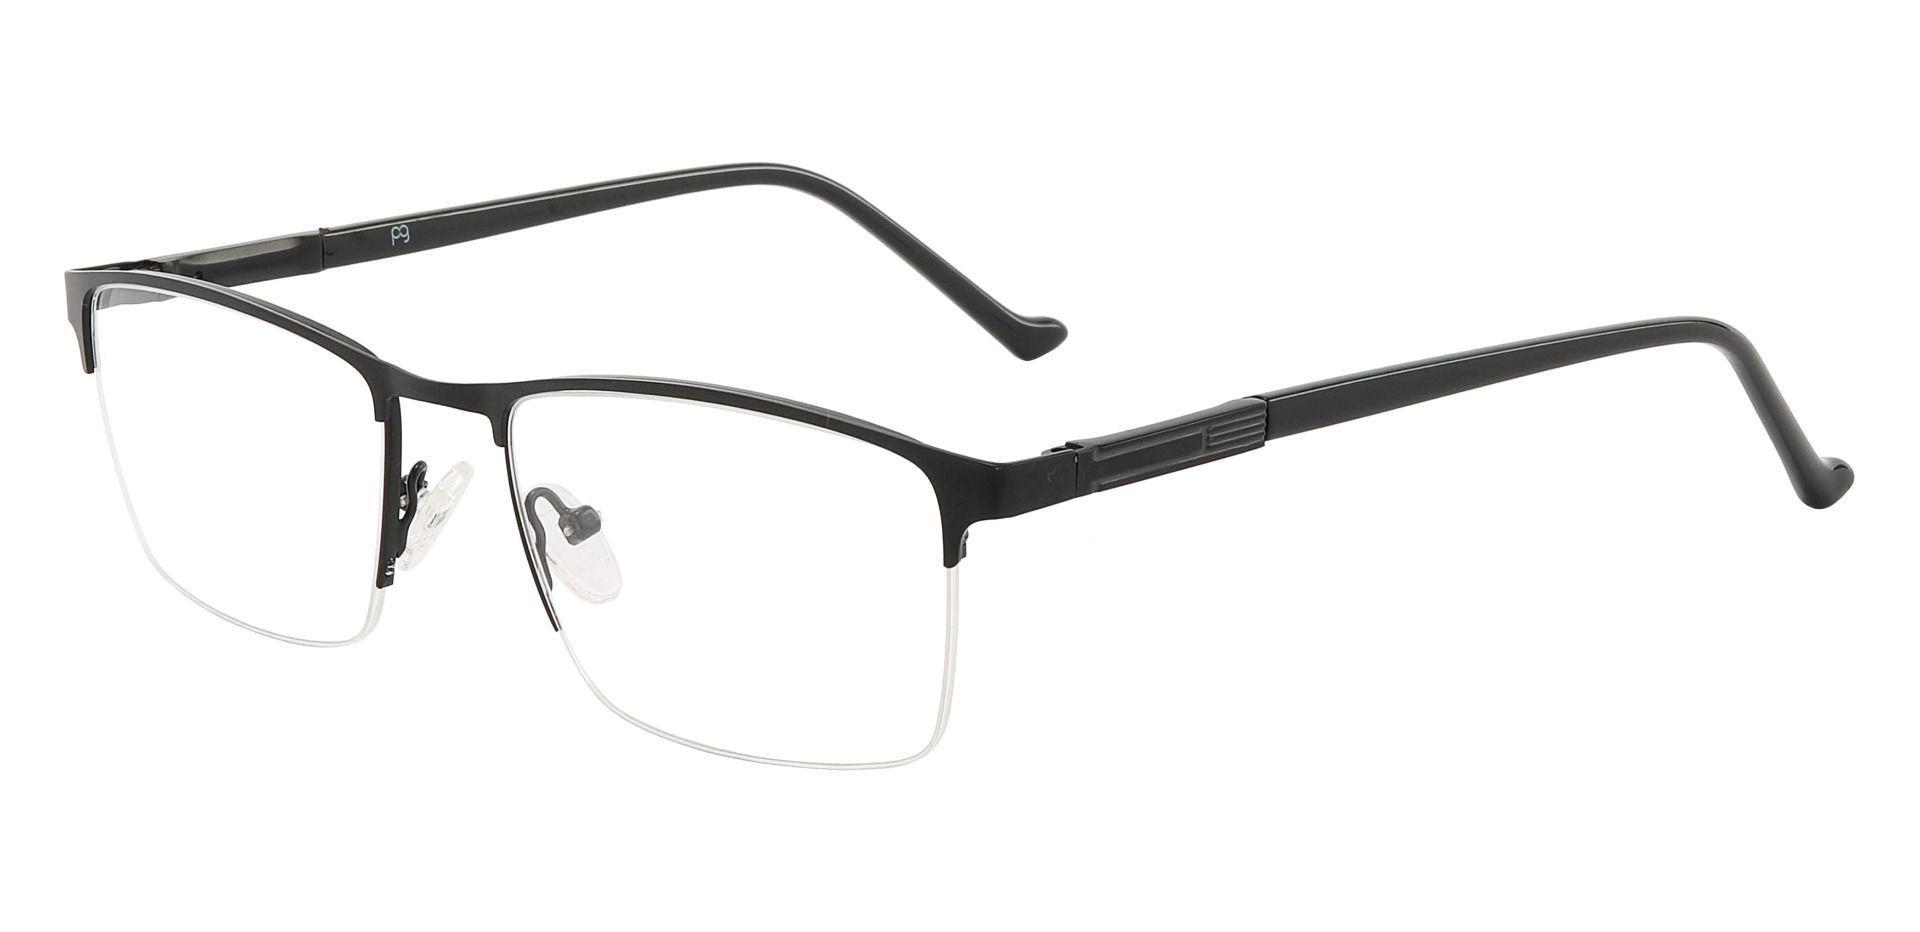 Arbor Rectangle Prescription Glasses - Black